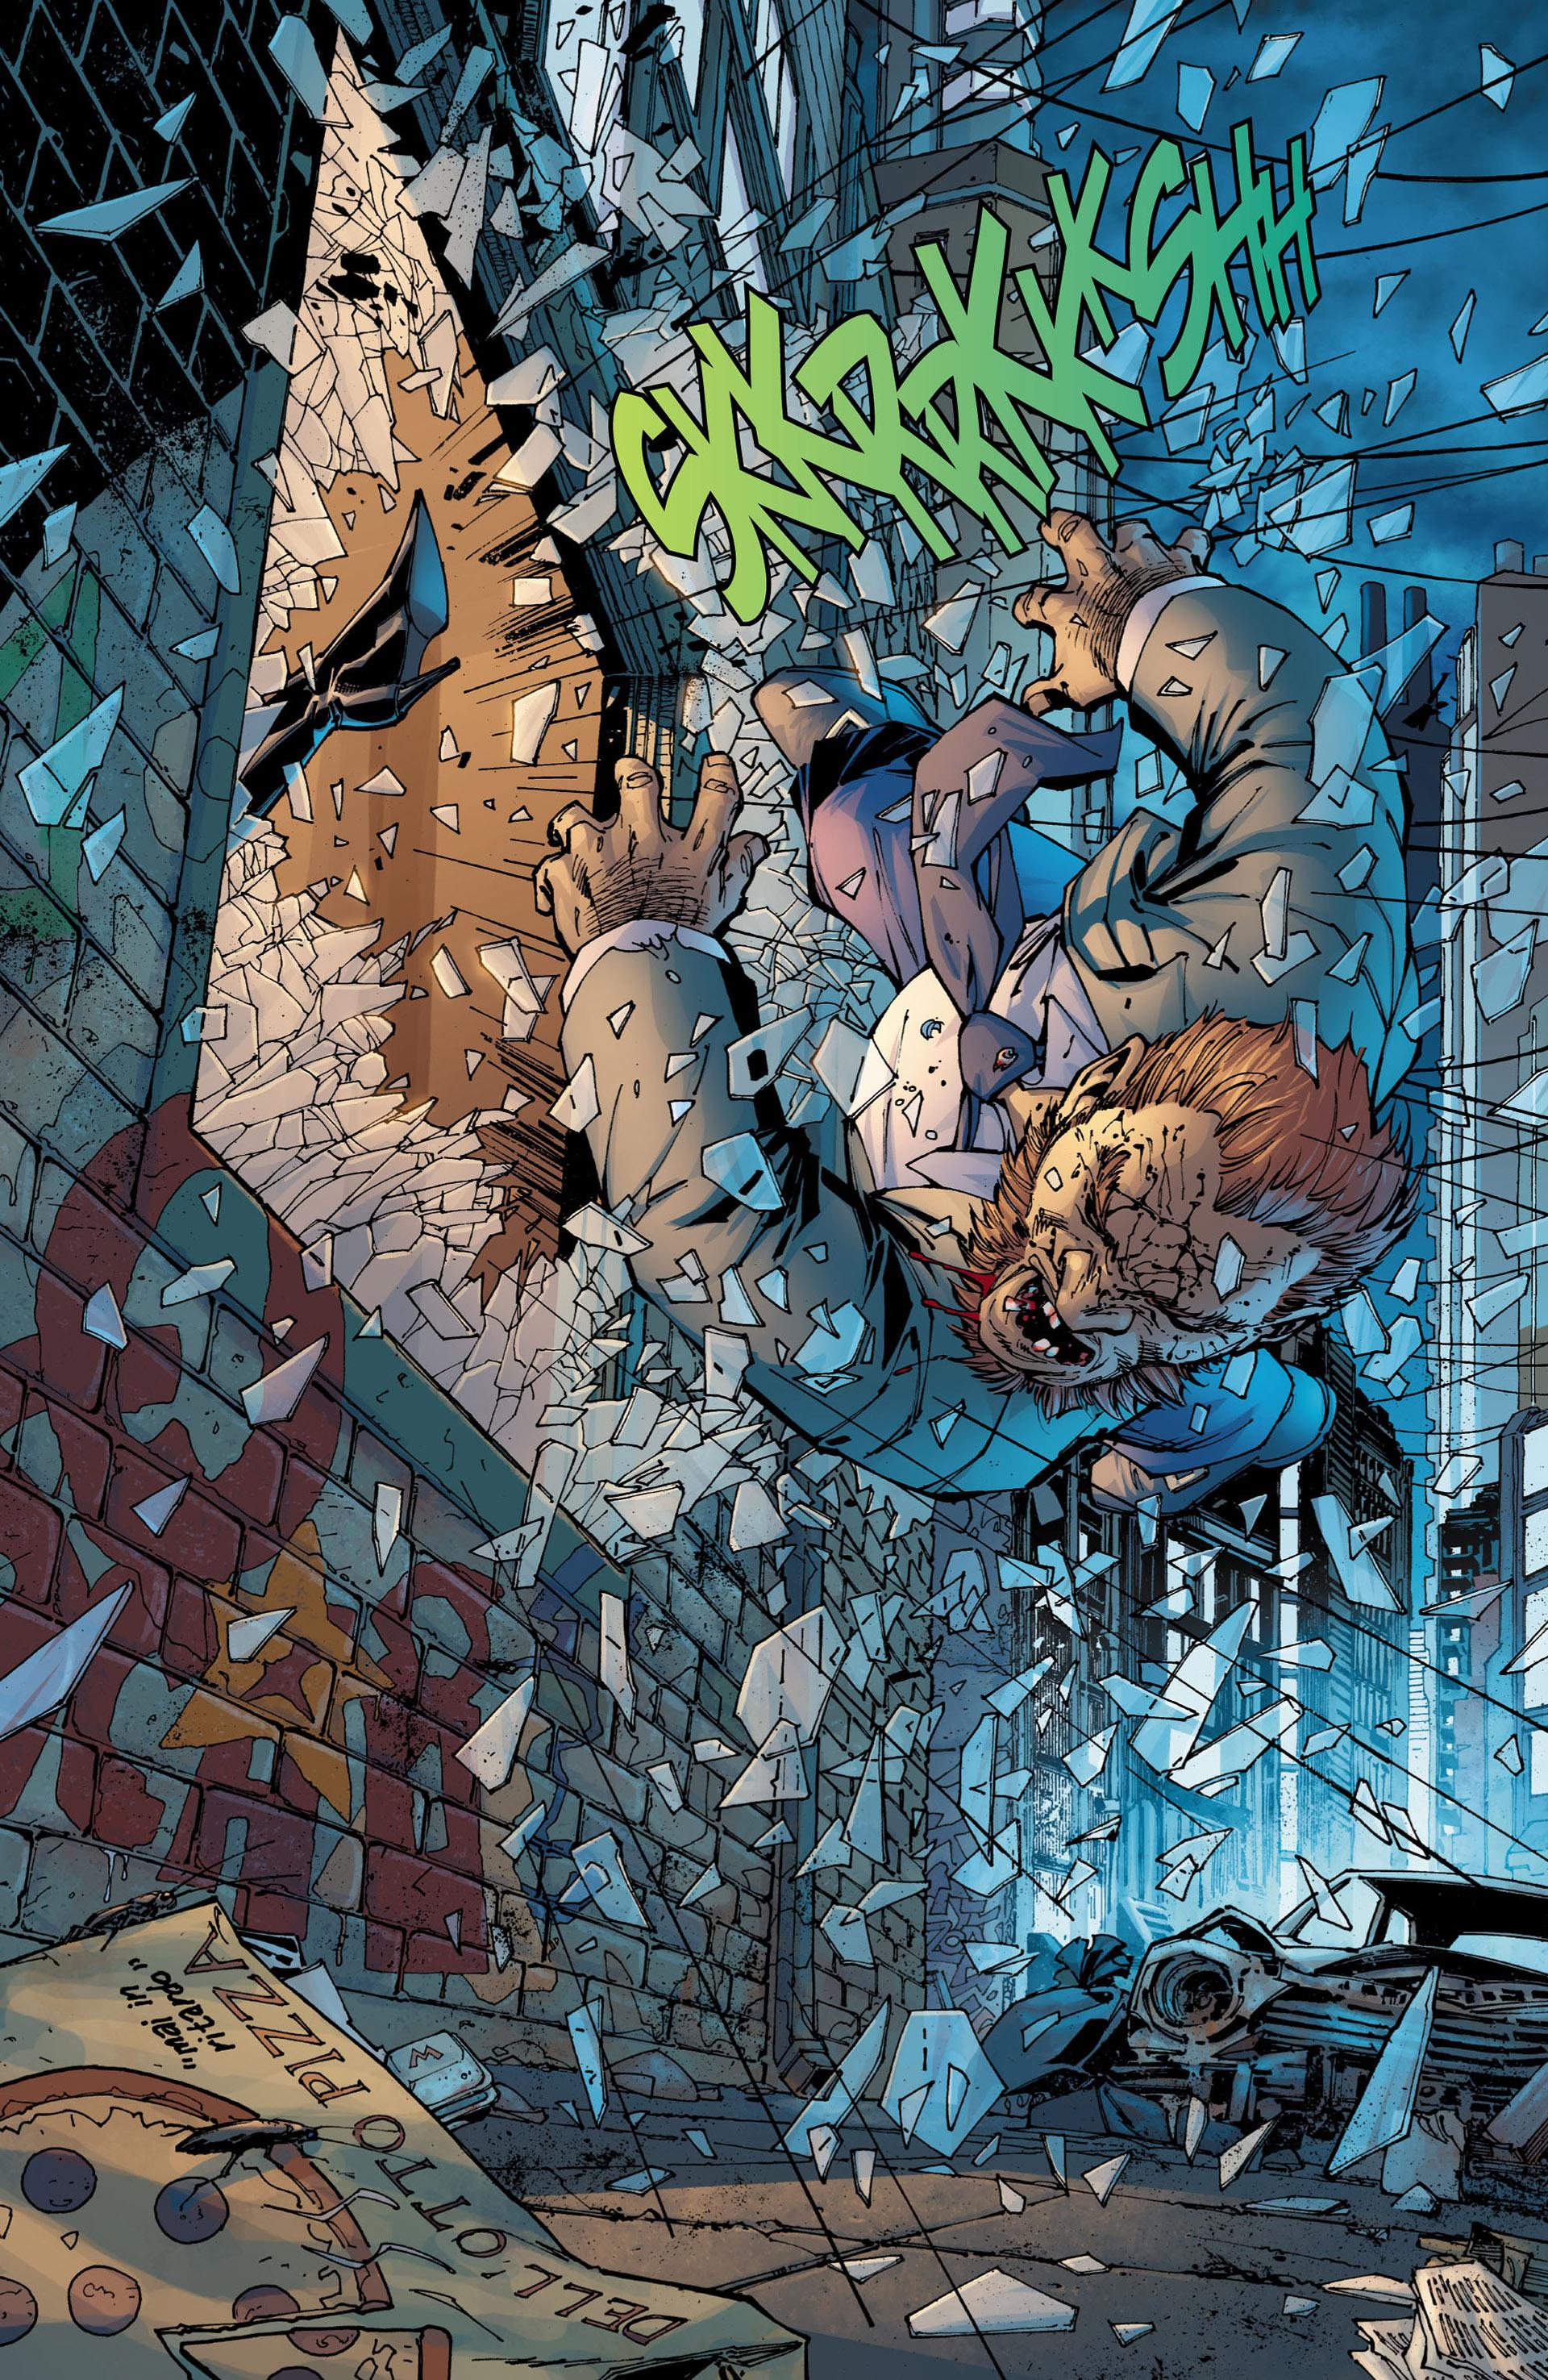 Read online All Star Batman & Robin, The Boy Wonder comic -  Issue #3 - 14